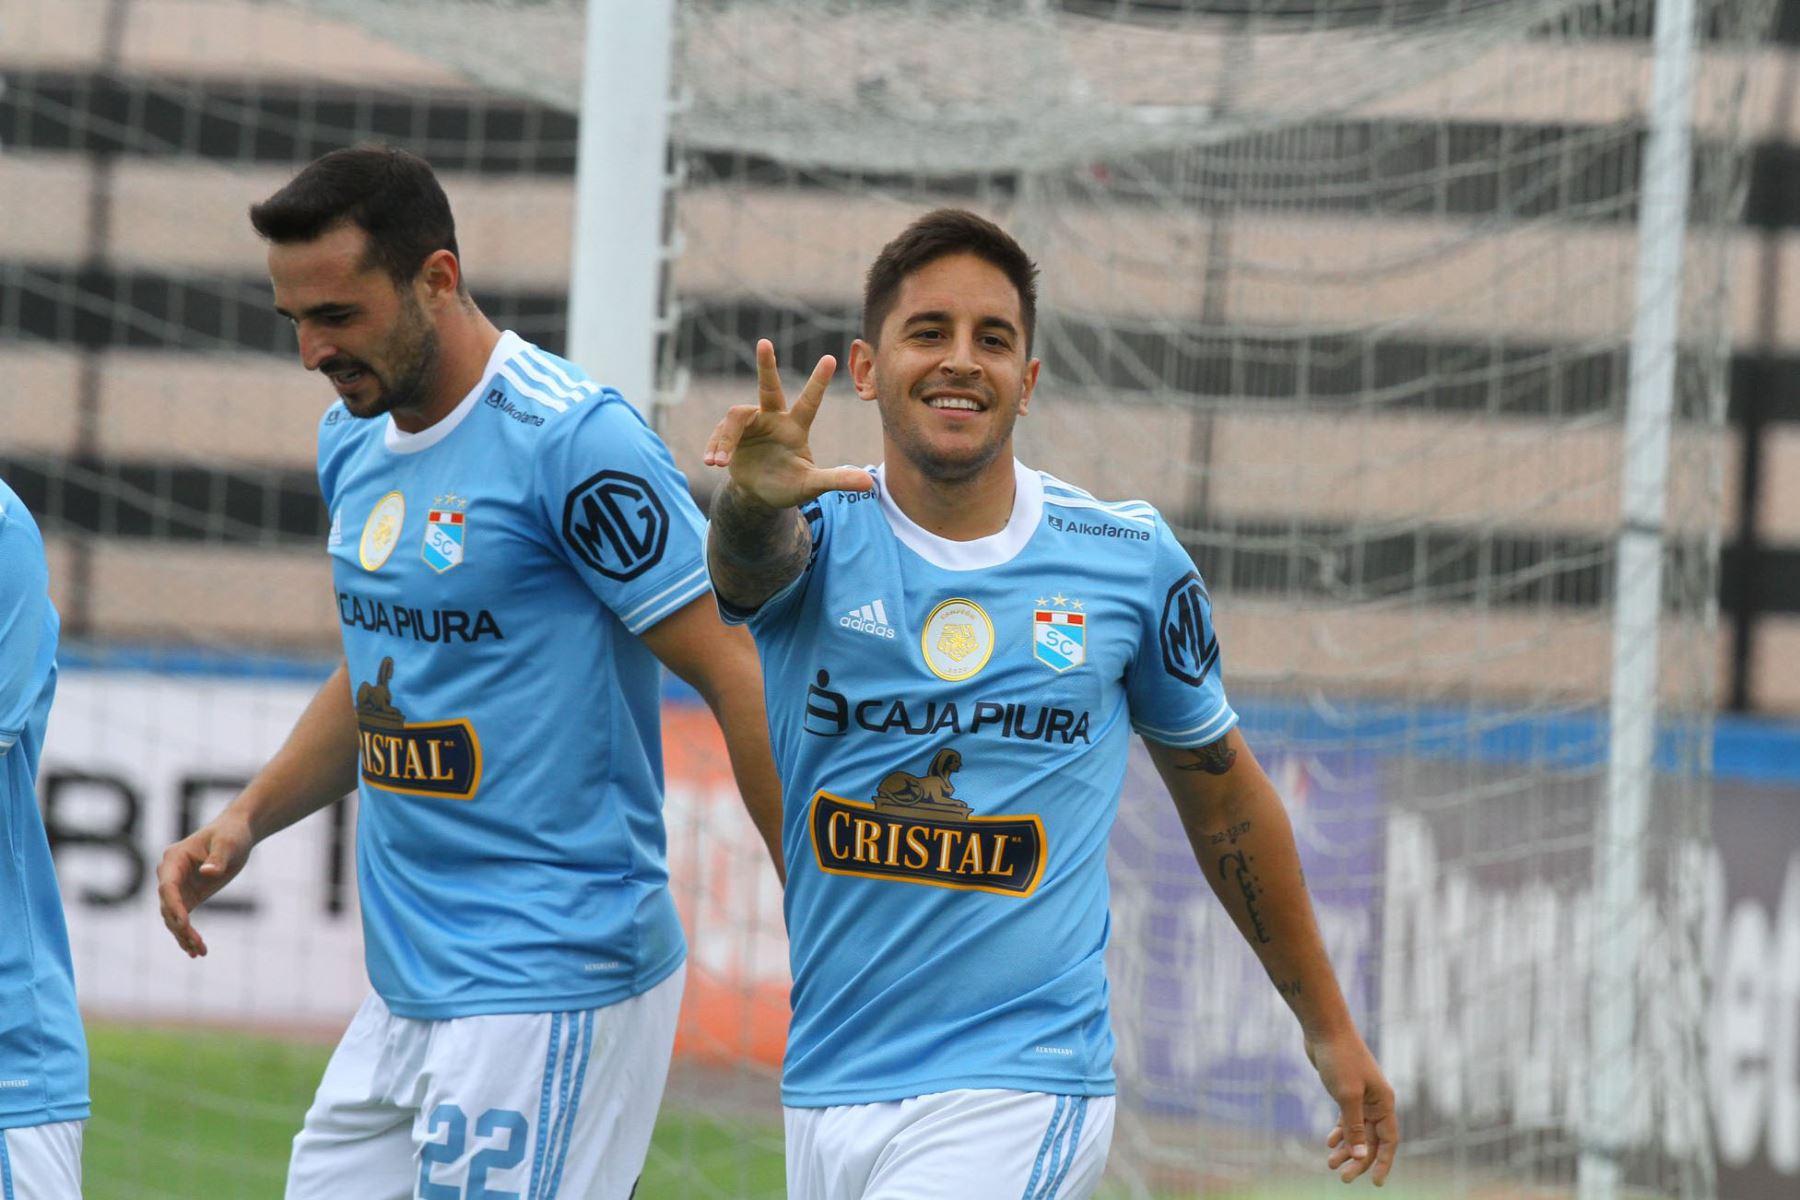 Alejandro Hohberg de Cristal celebra su gol ante el Cusco F.C  por la séptima  fecha de la fase 1, en el estadio Miguel Grau .  Foto: @LigaFutProf